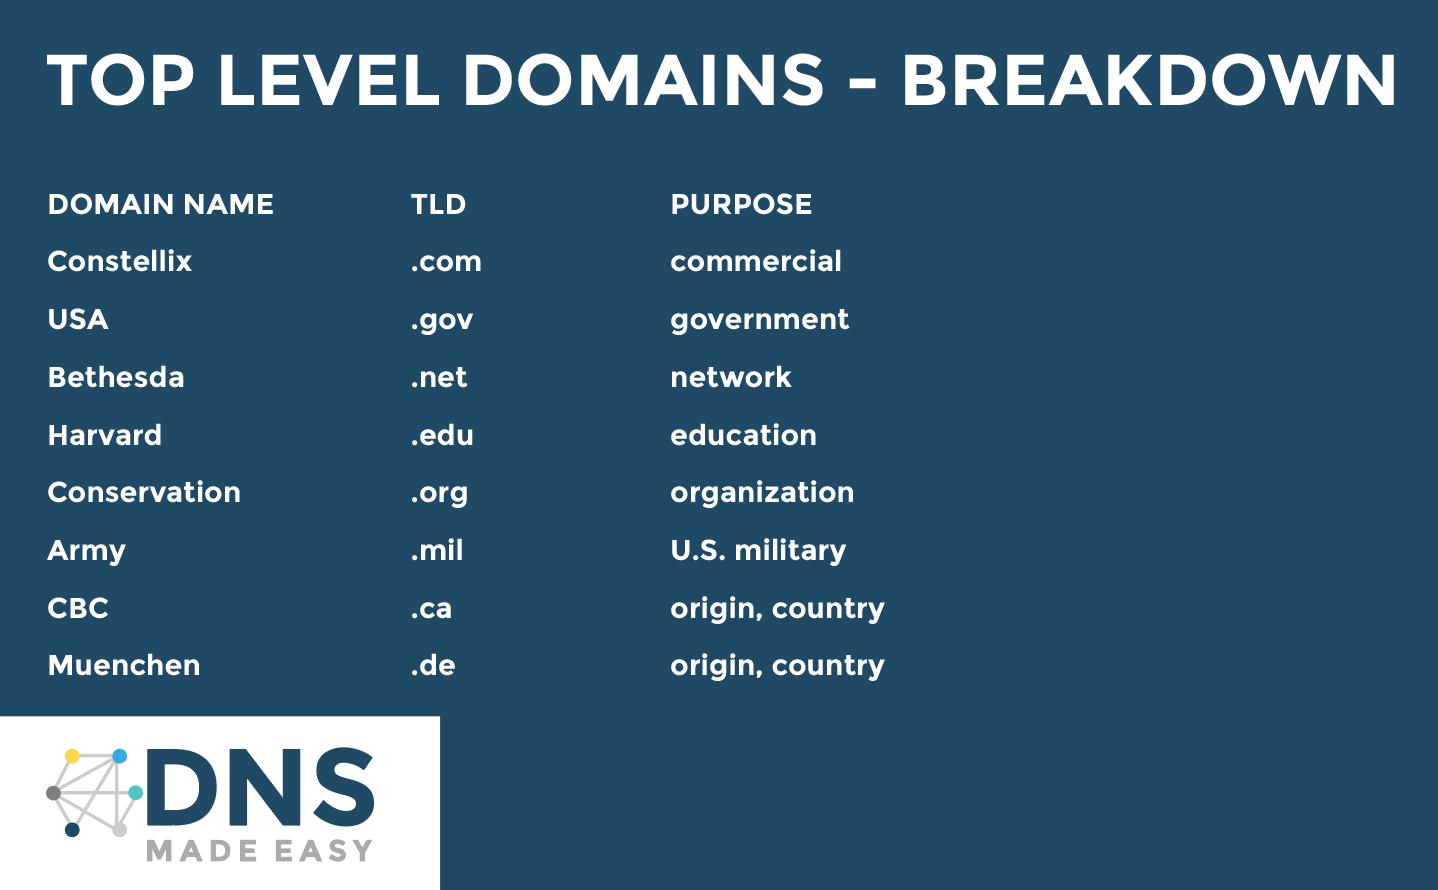 Top Level Domains - Breakdown